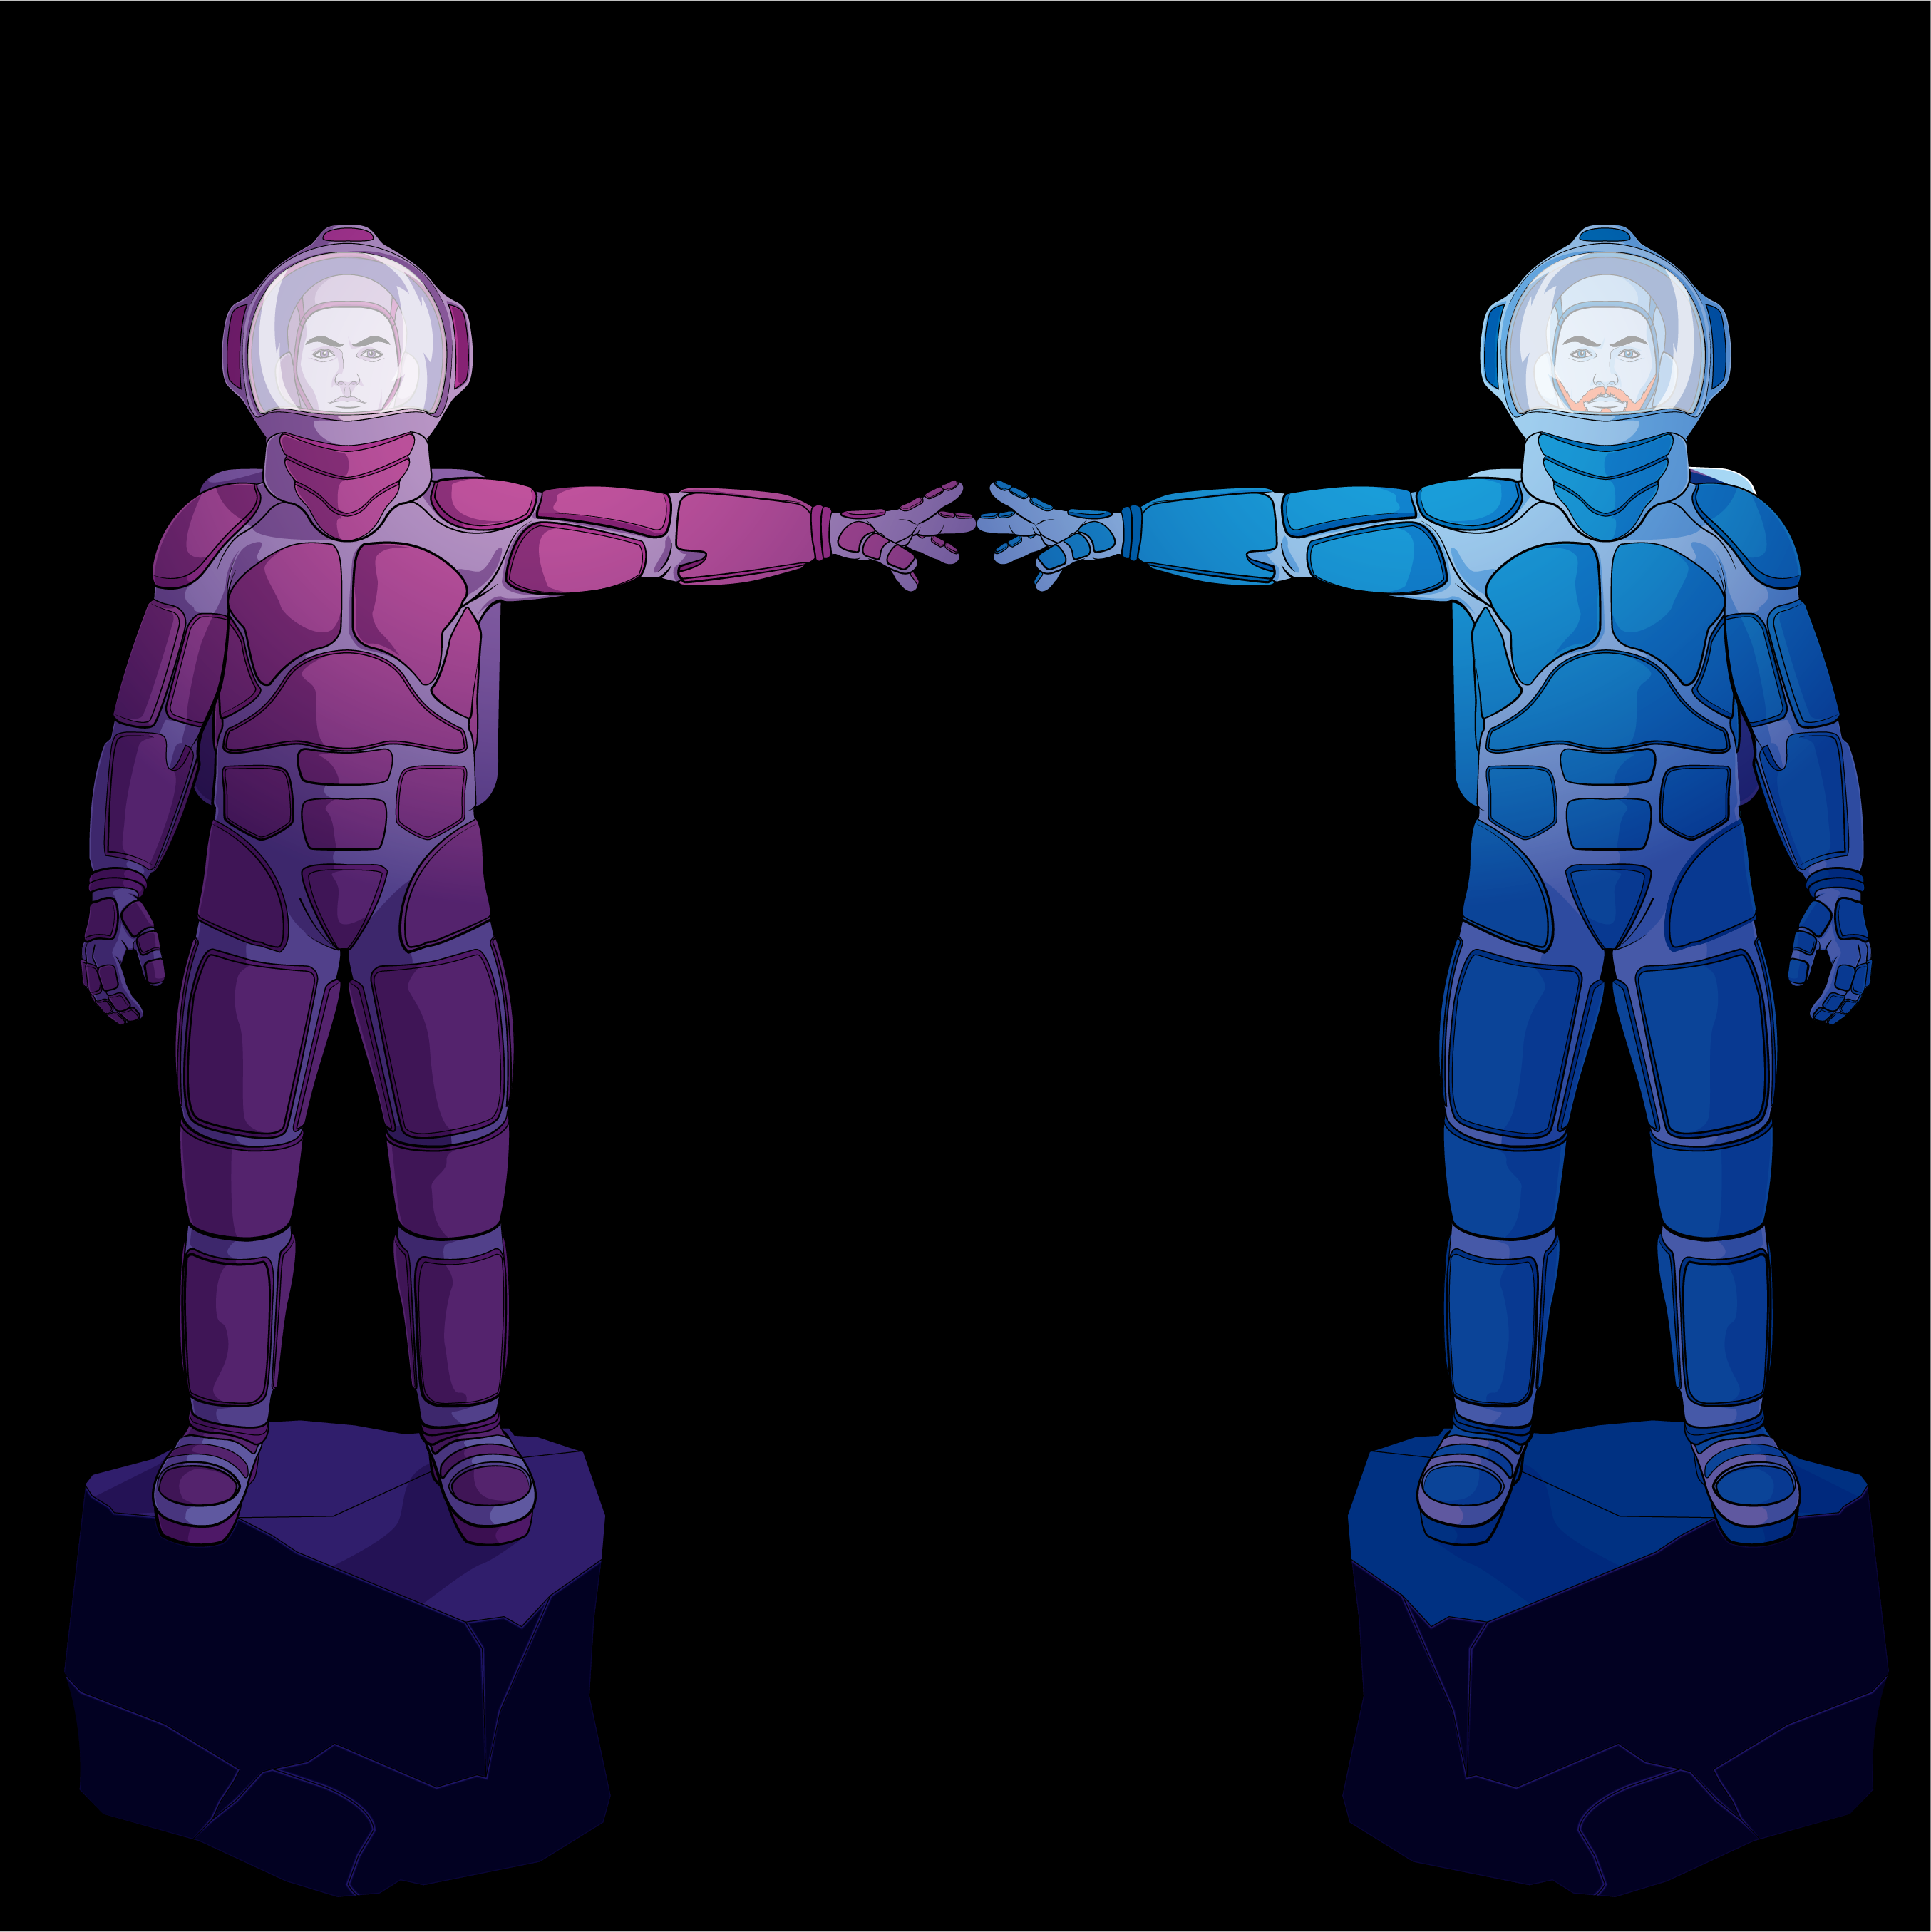 two astronauts grabbing hands